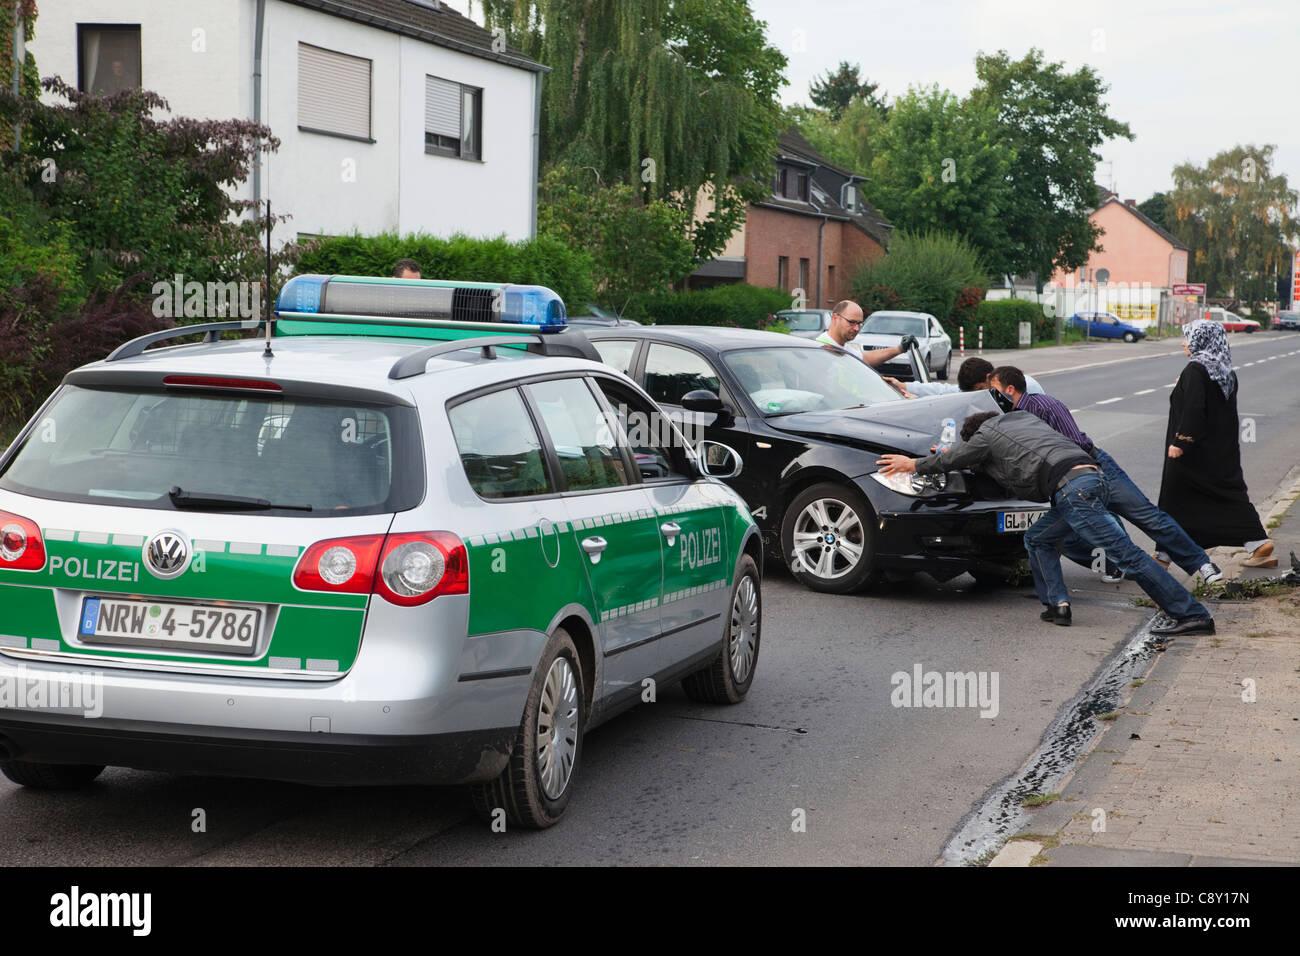 Germany, Car Accident Scene near Koln Stock Photo: 39931689